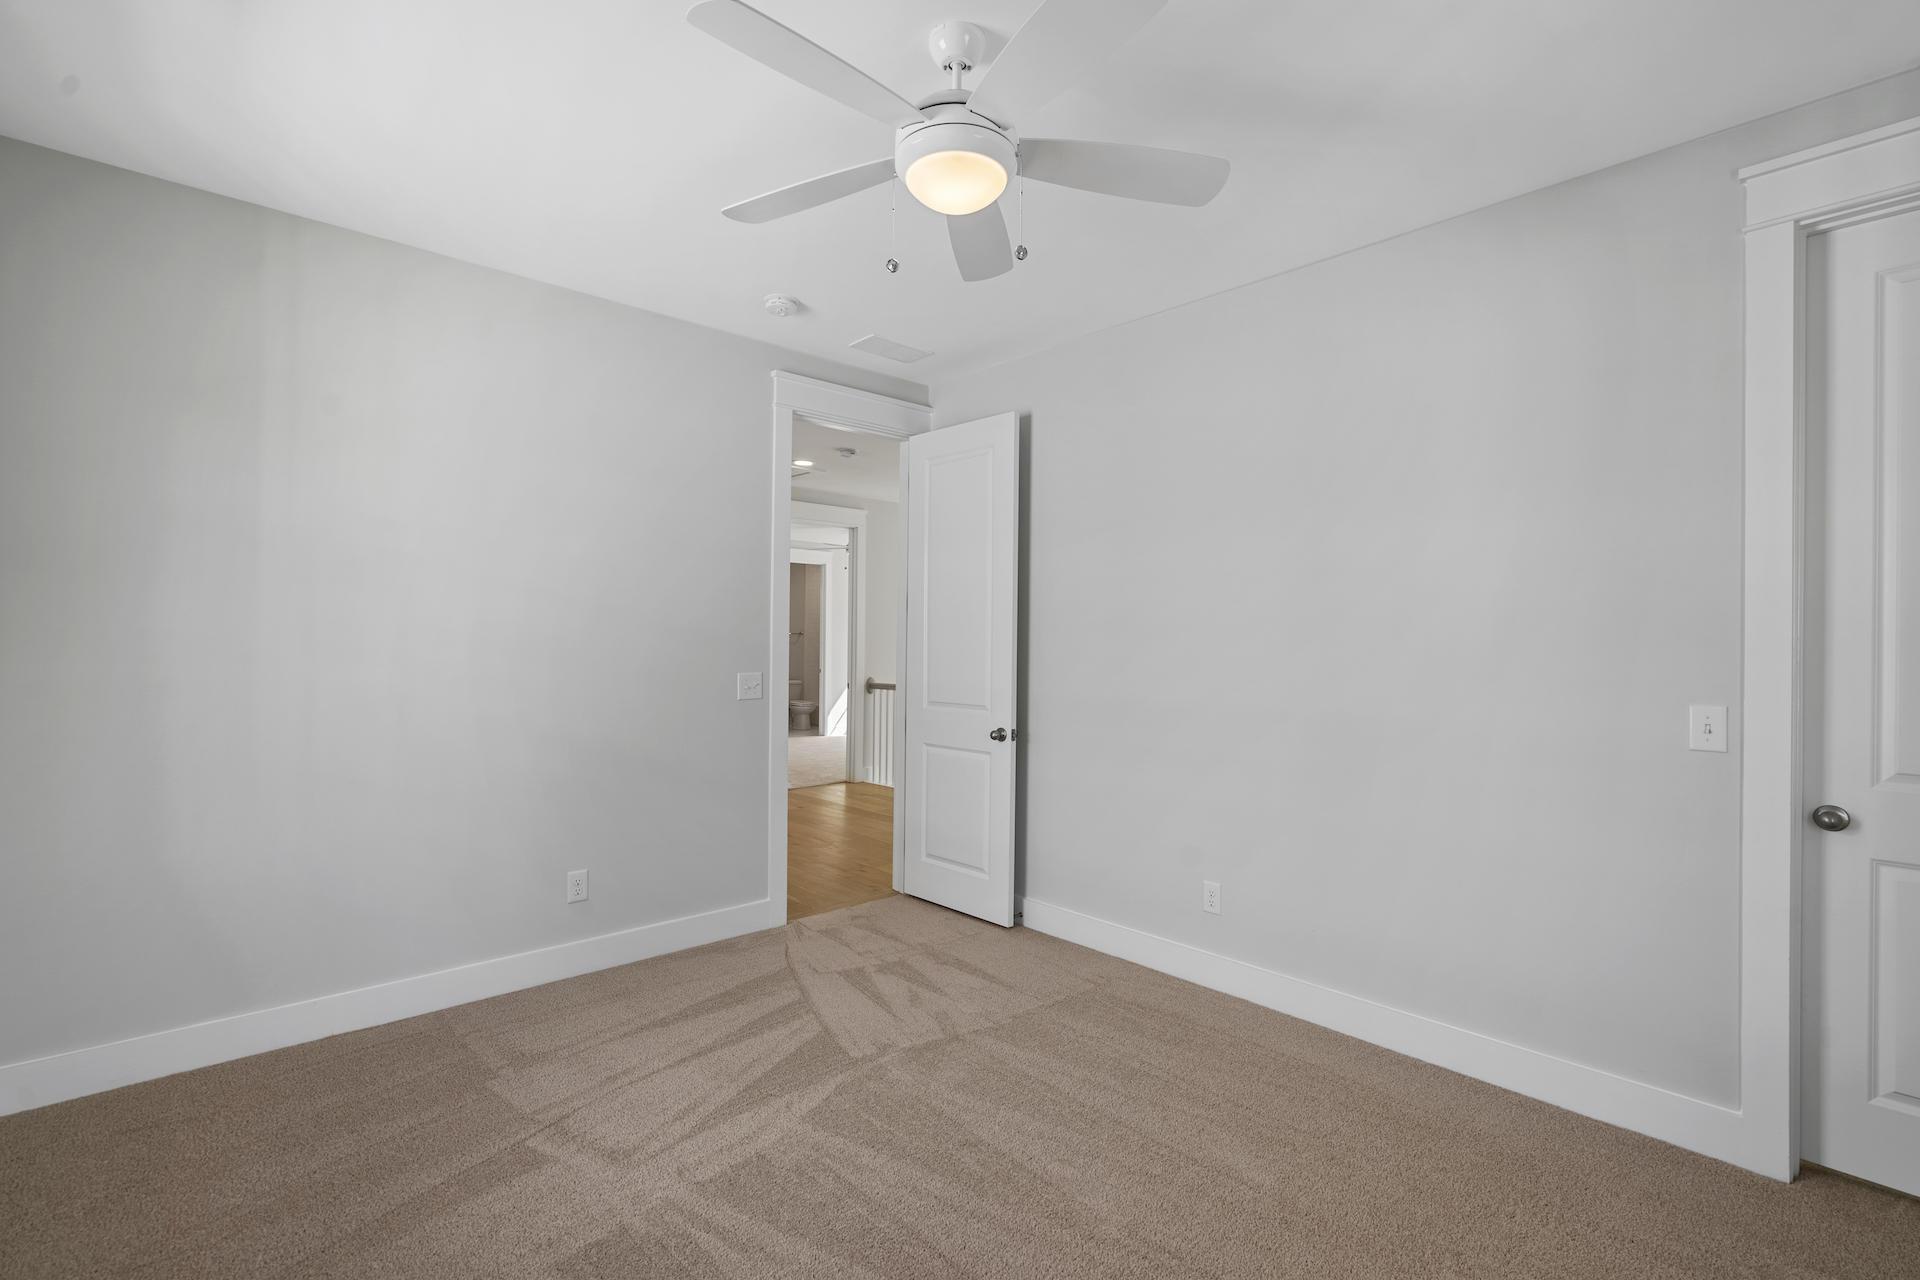 Midtown Homes For Sale - 1328 Upper Union, Mount Pleasant, SC - 4